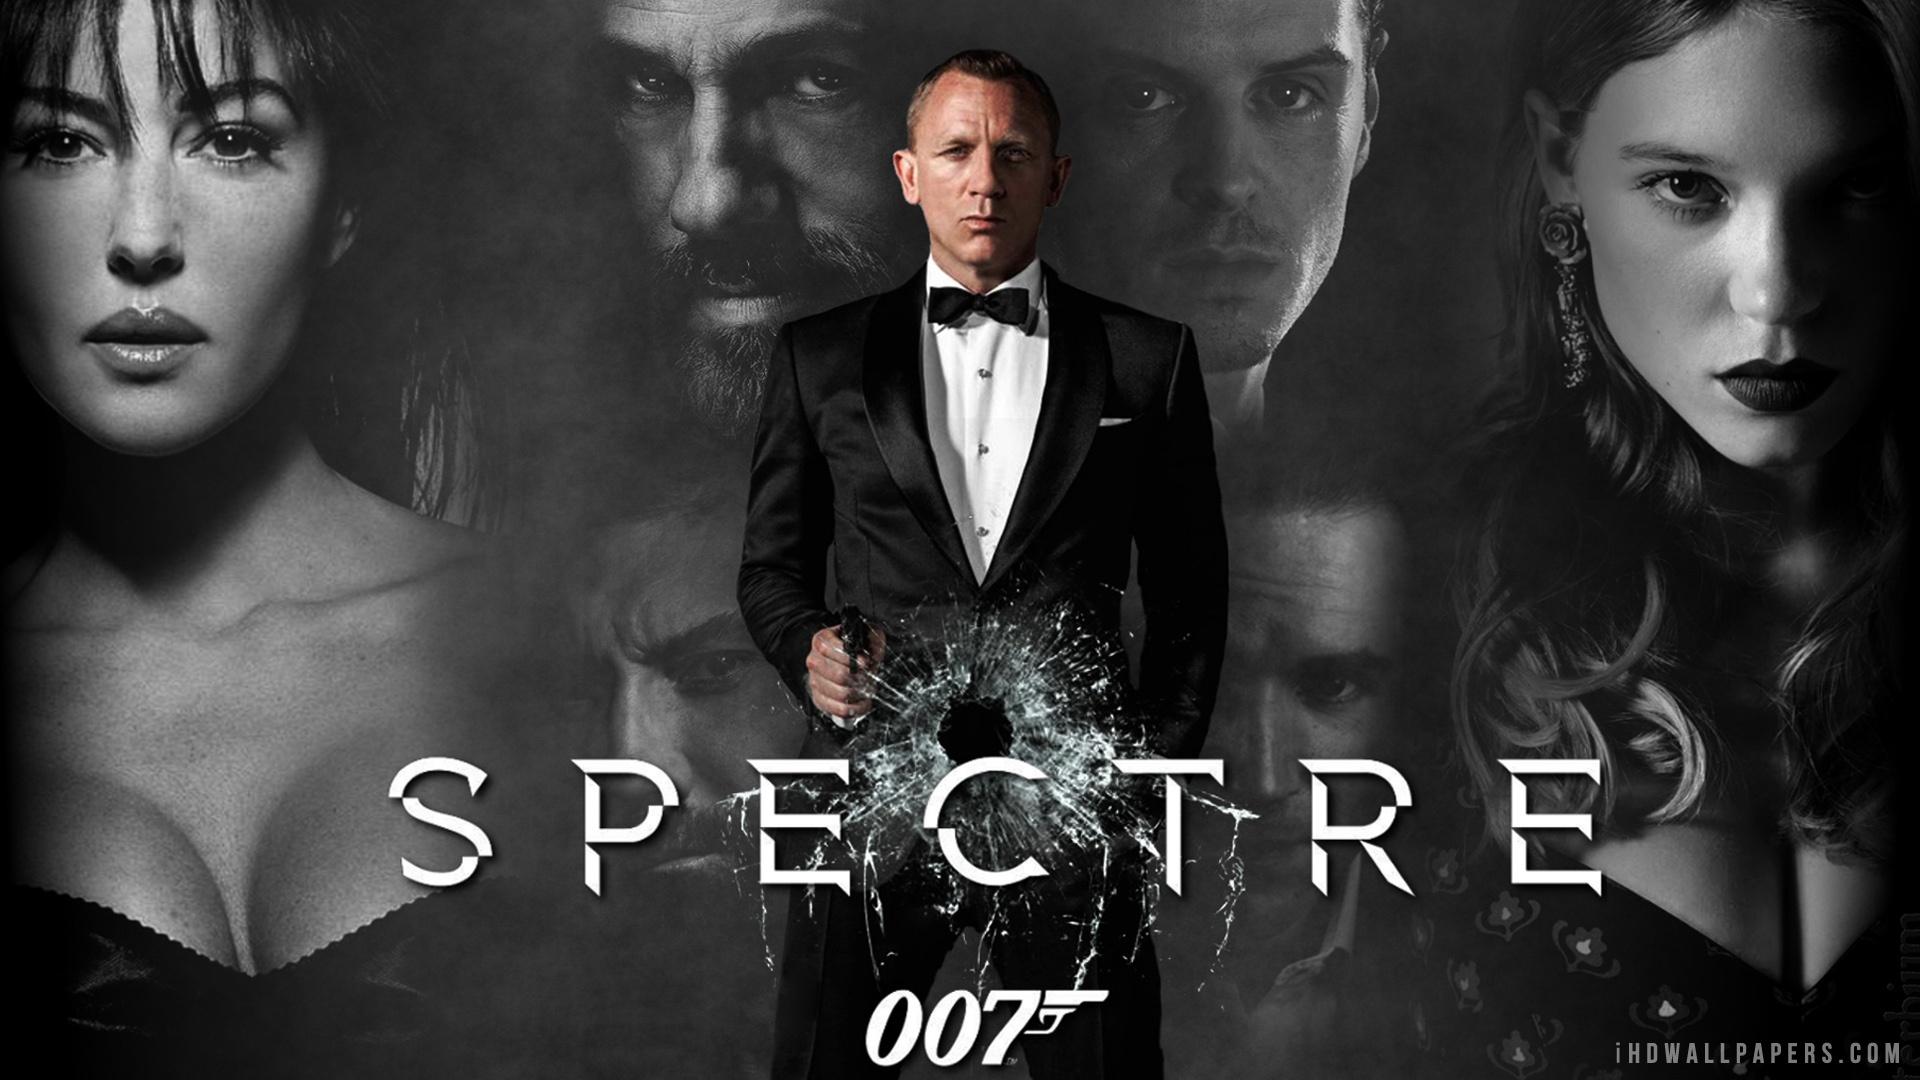 Spectre Movie 2015 HD Wallpaper   iHD Wallpapers 1920x1080